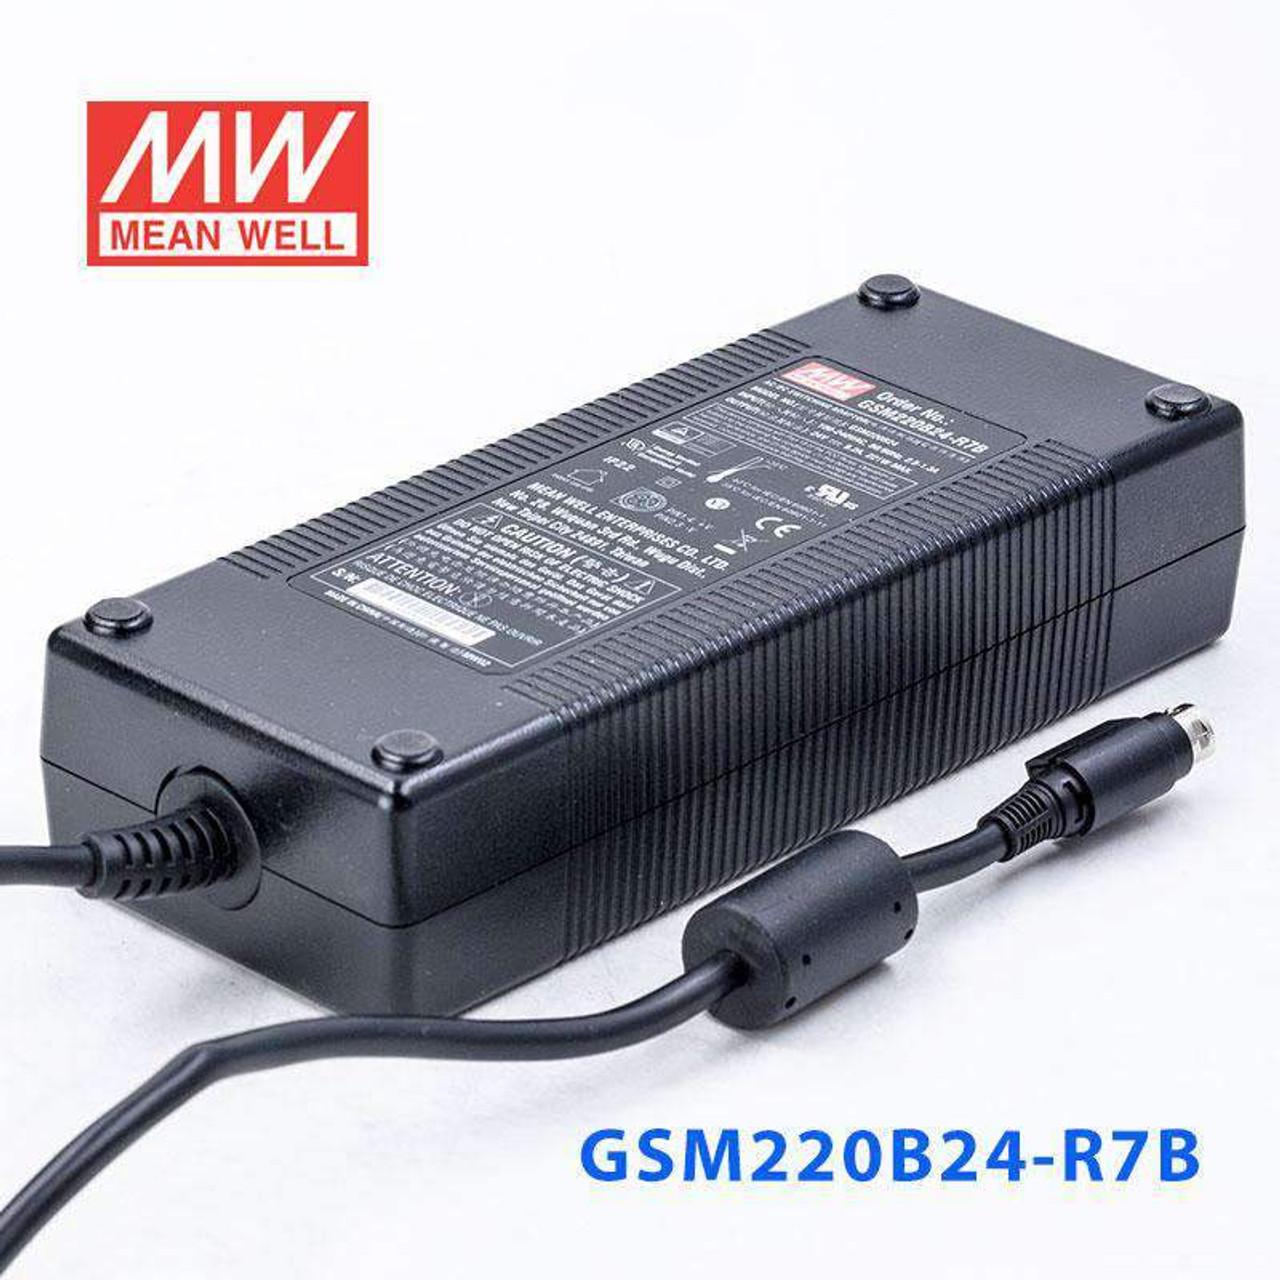 Pack of 1 GSM220B24-R7B AC//DC DESKTOP ADAPTER 24V 221W